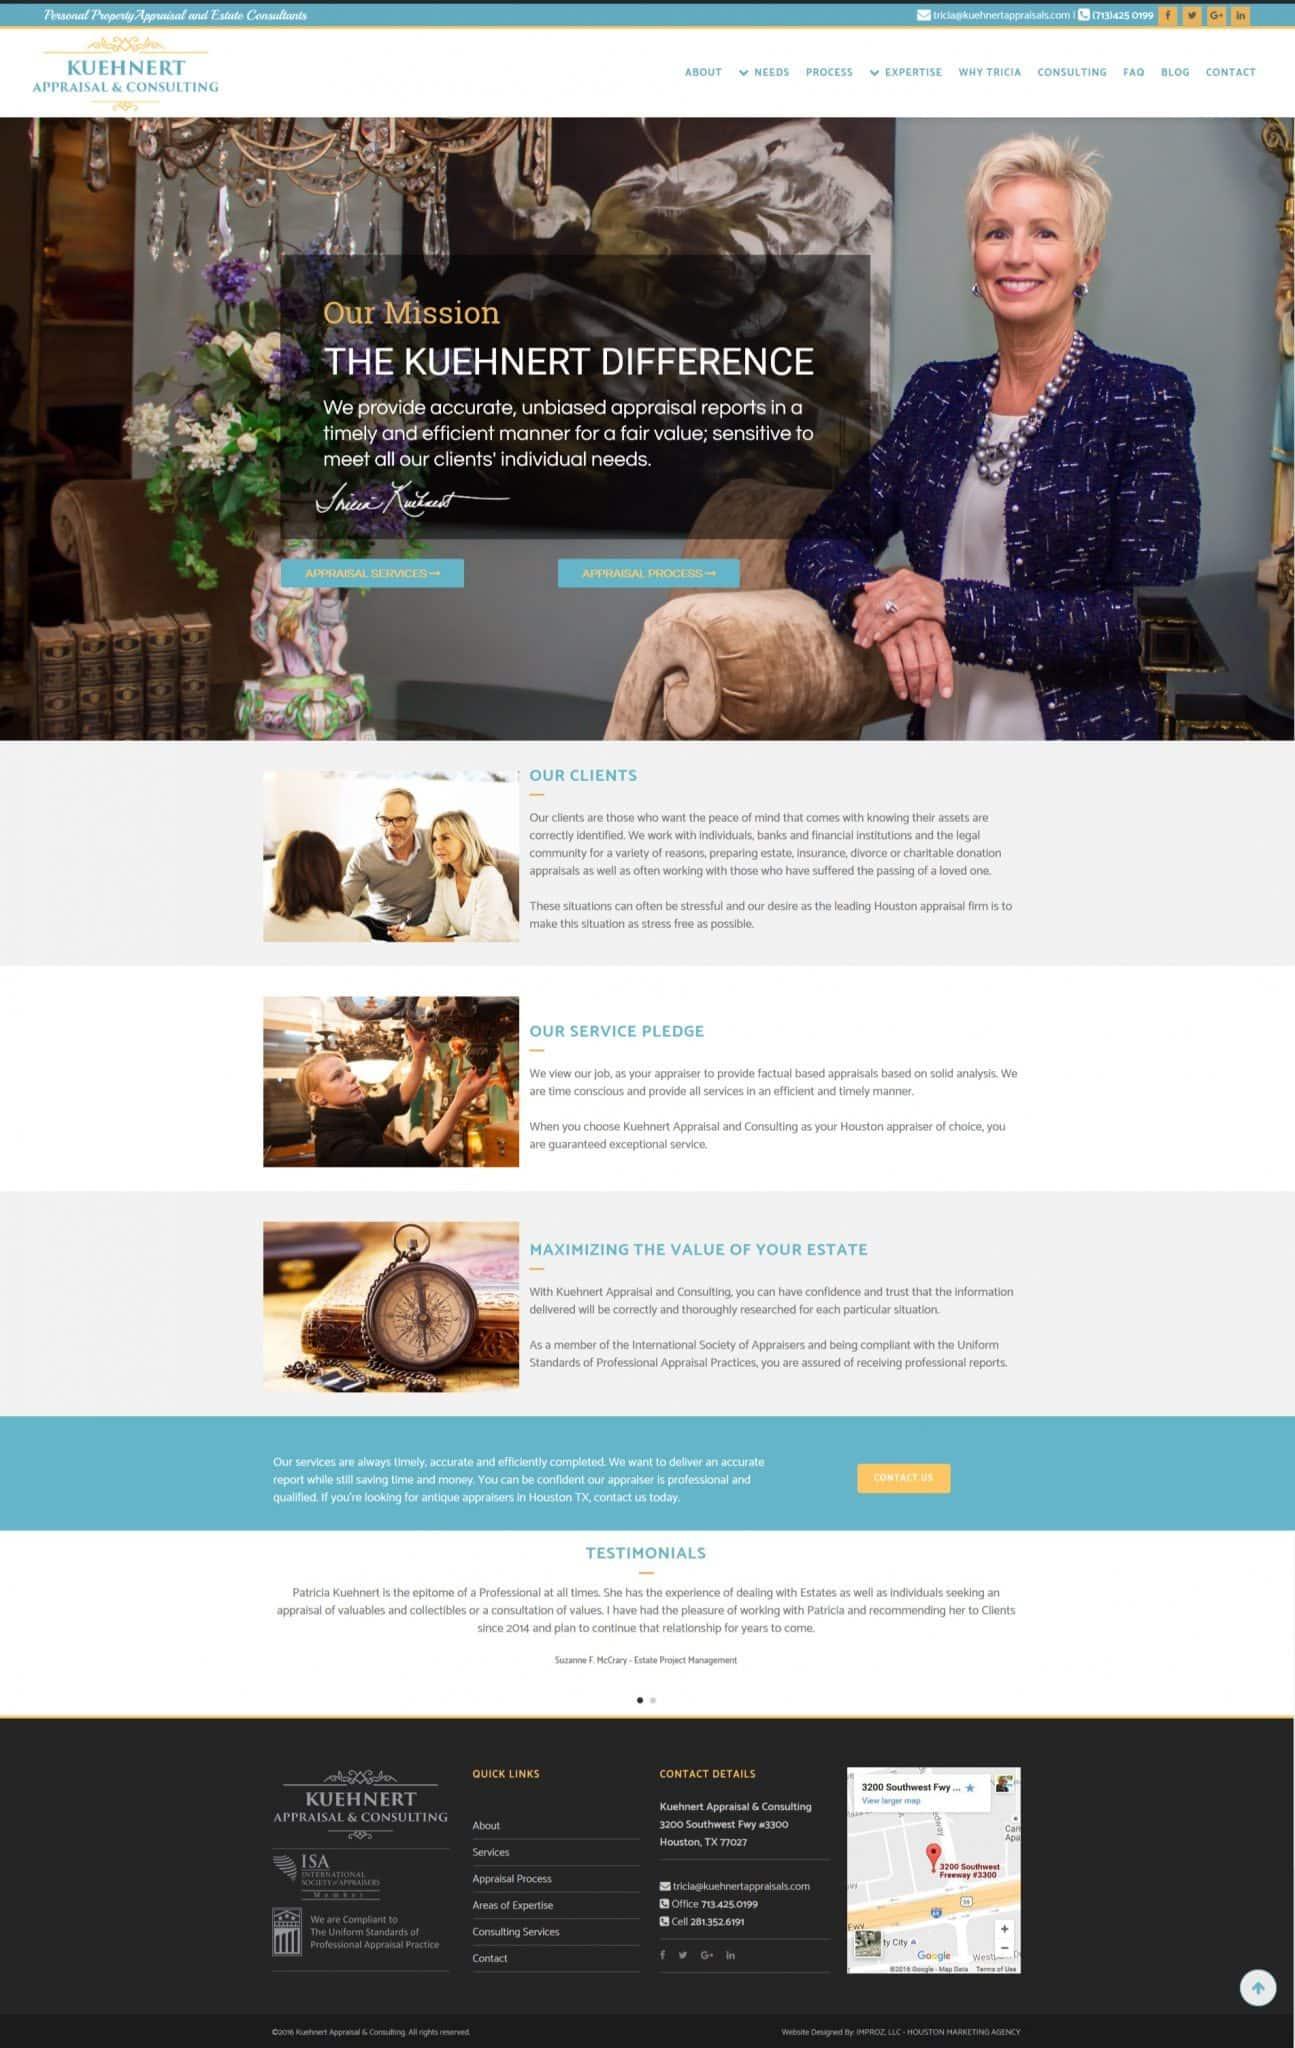 This website design portfolio item is for our client Kuehnert and Appraisals